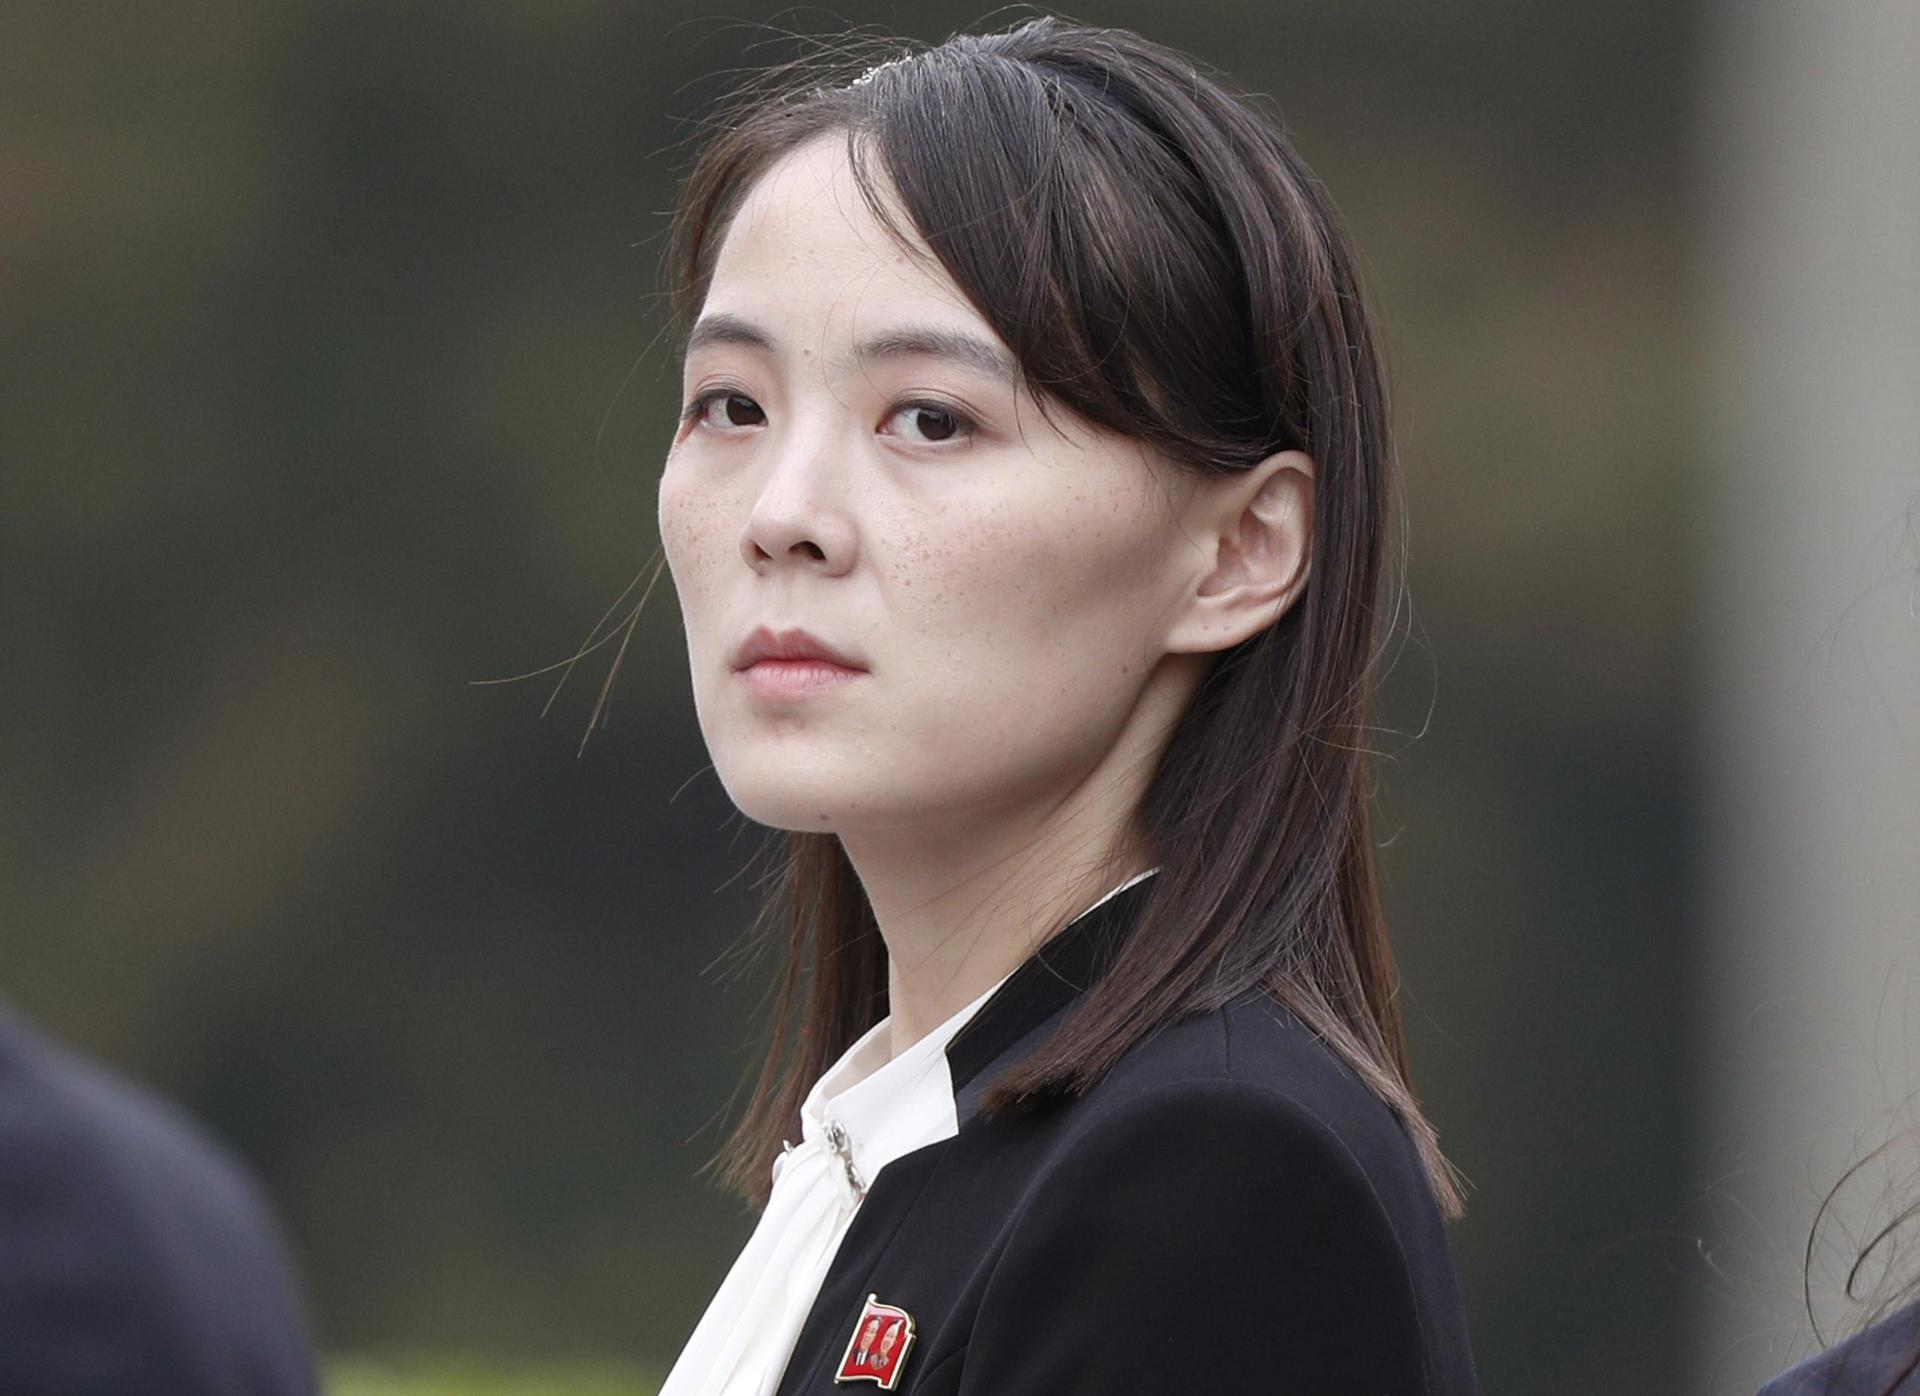 Nordkorea droht den USA und Südkorea wegen Militärübungen